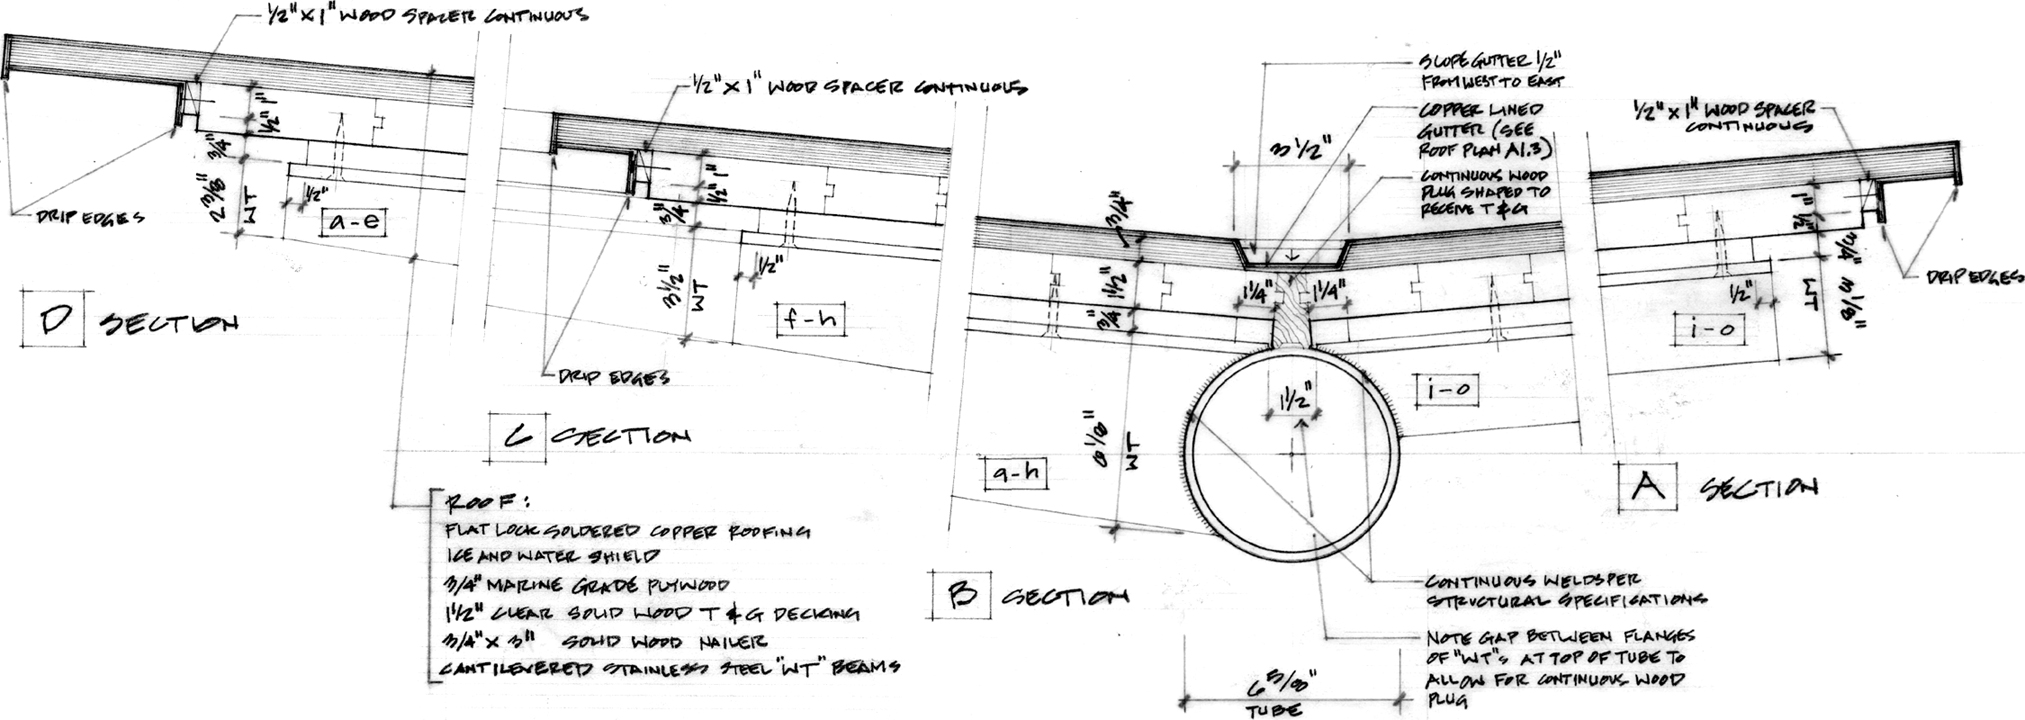 Bus-Shelter-Drawing_001-.jpg